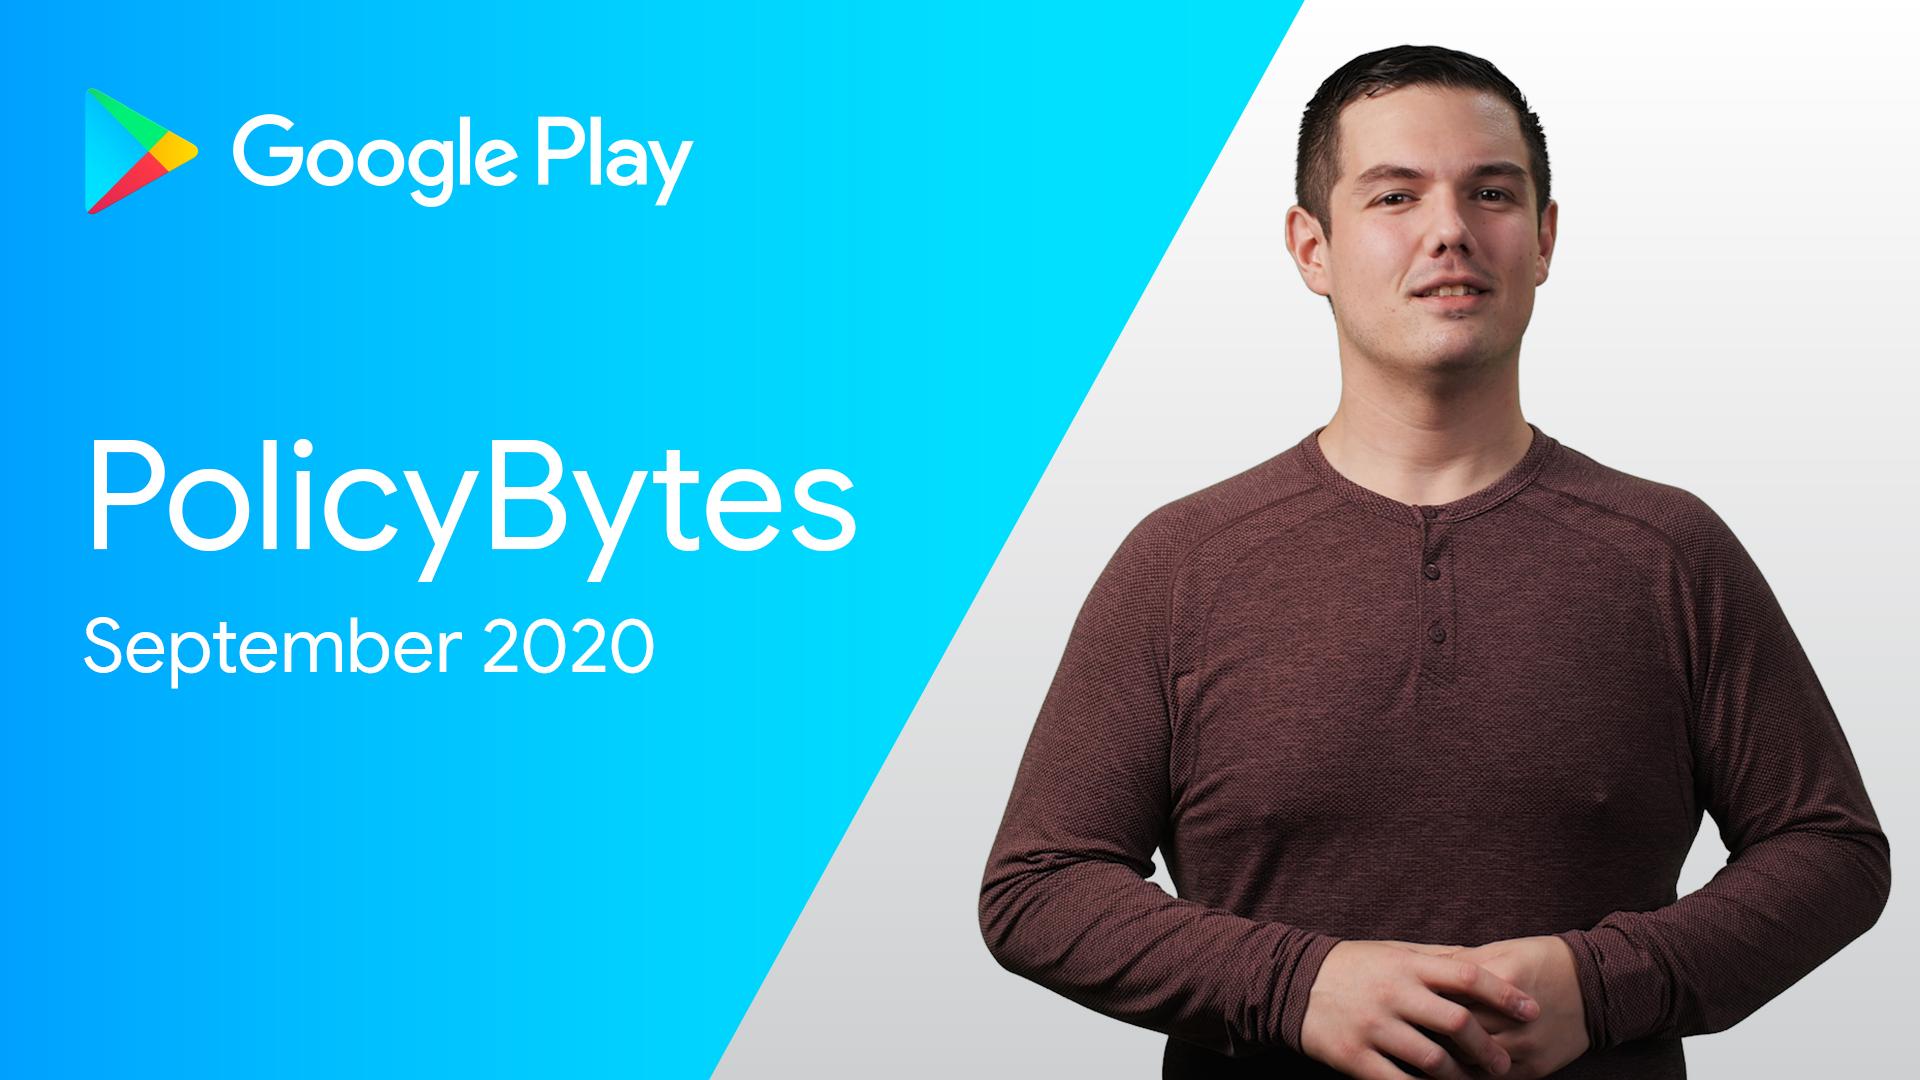 Google Play PolicyBytes - การปรับปรุงเมื่อเดือนกันยายน 2020 รูปภาพ